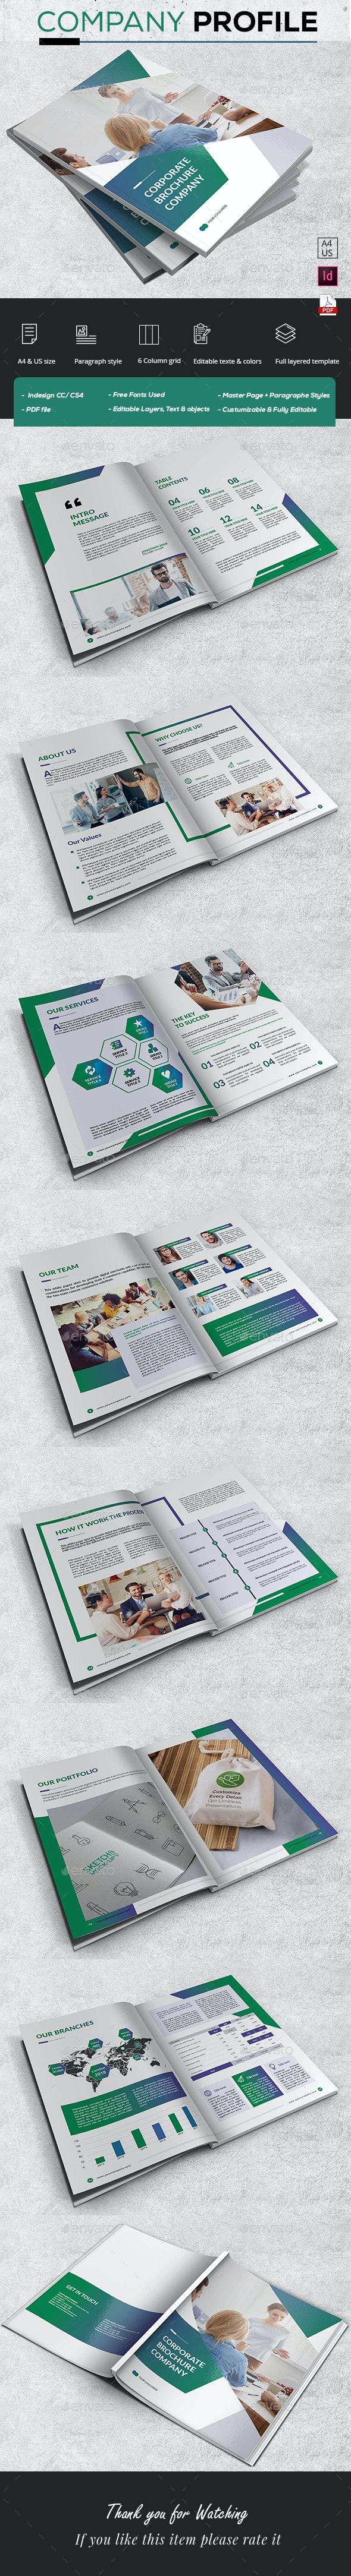 Stylish Company Brochure - Corporate Brochures